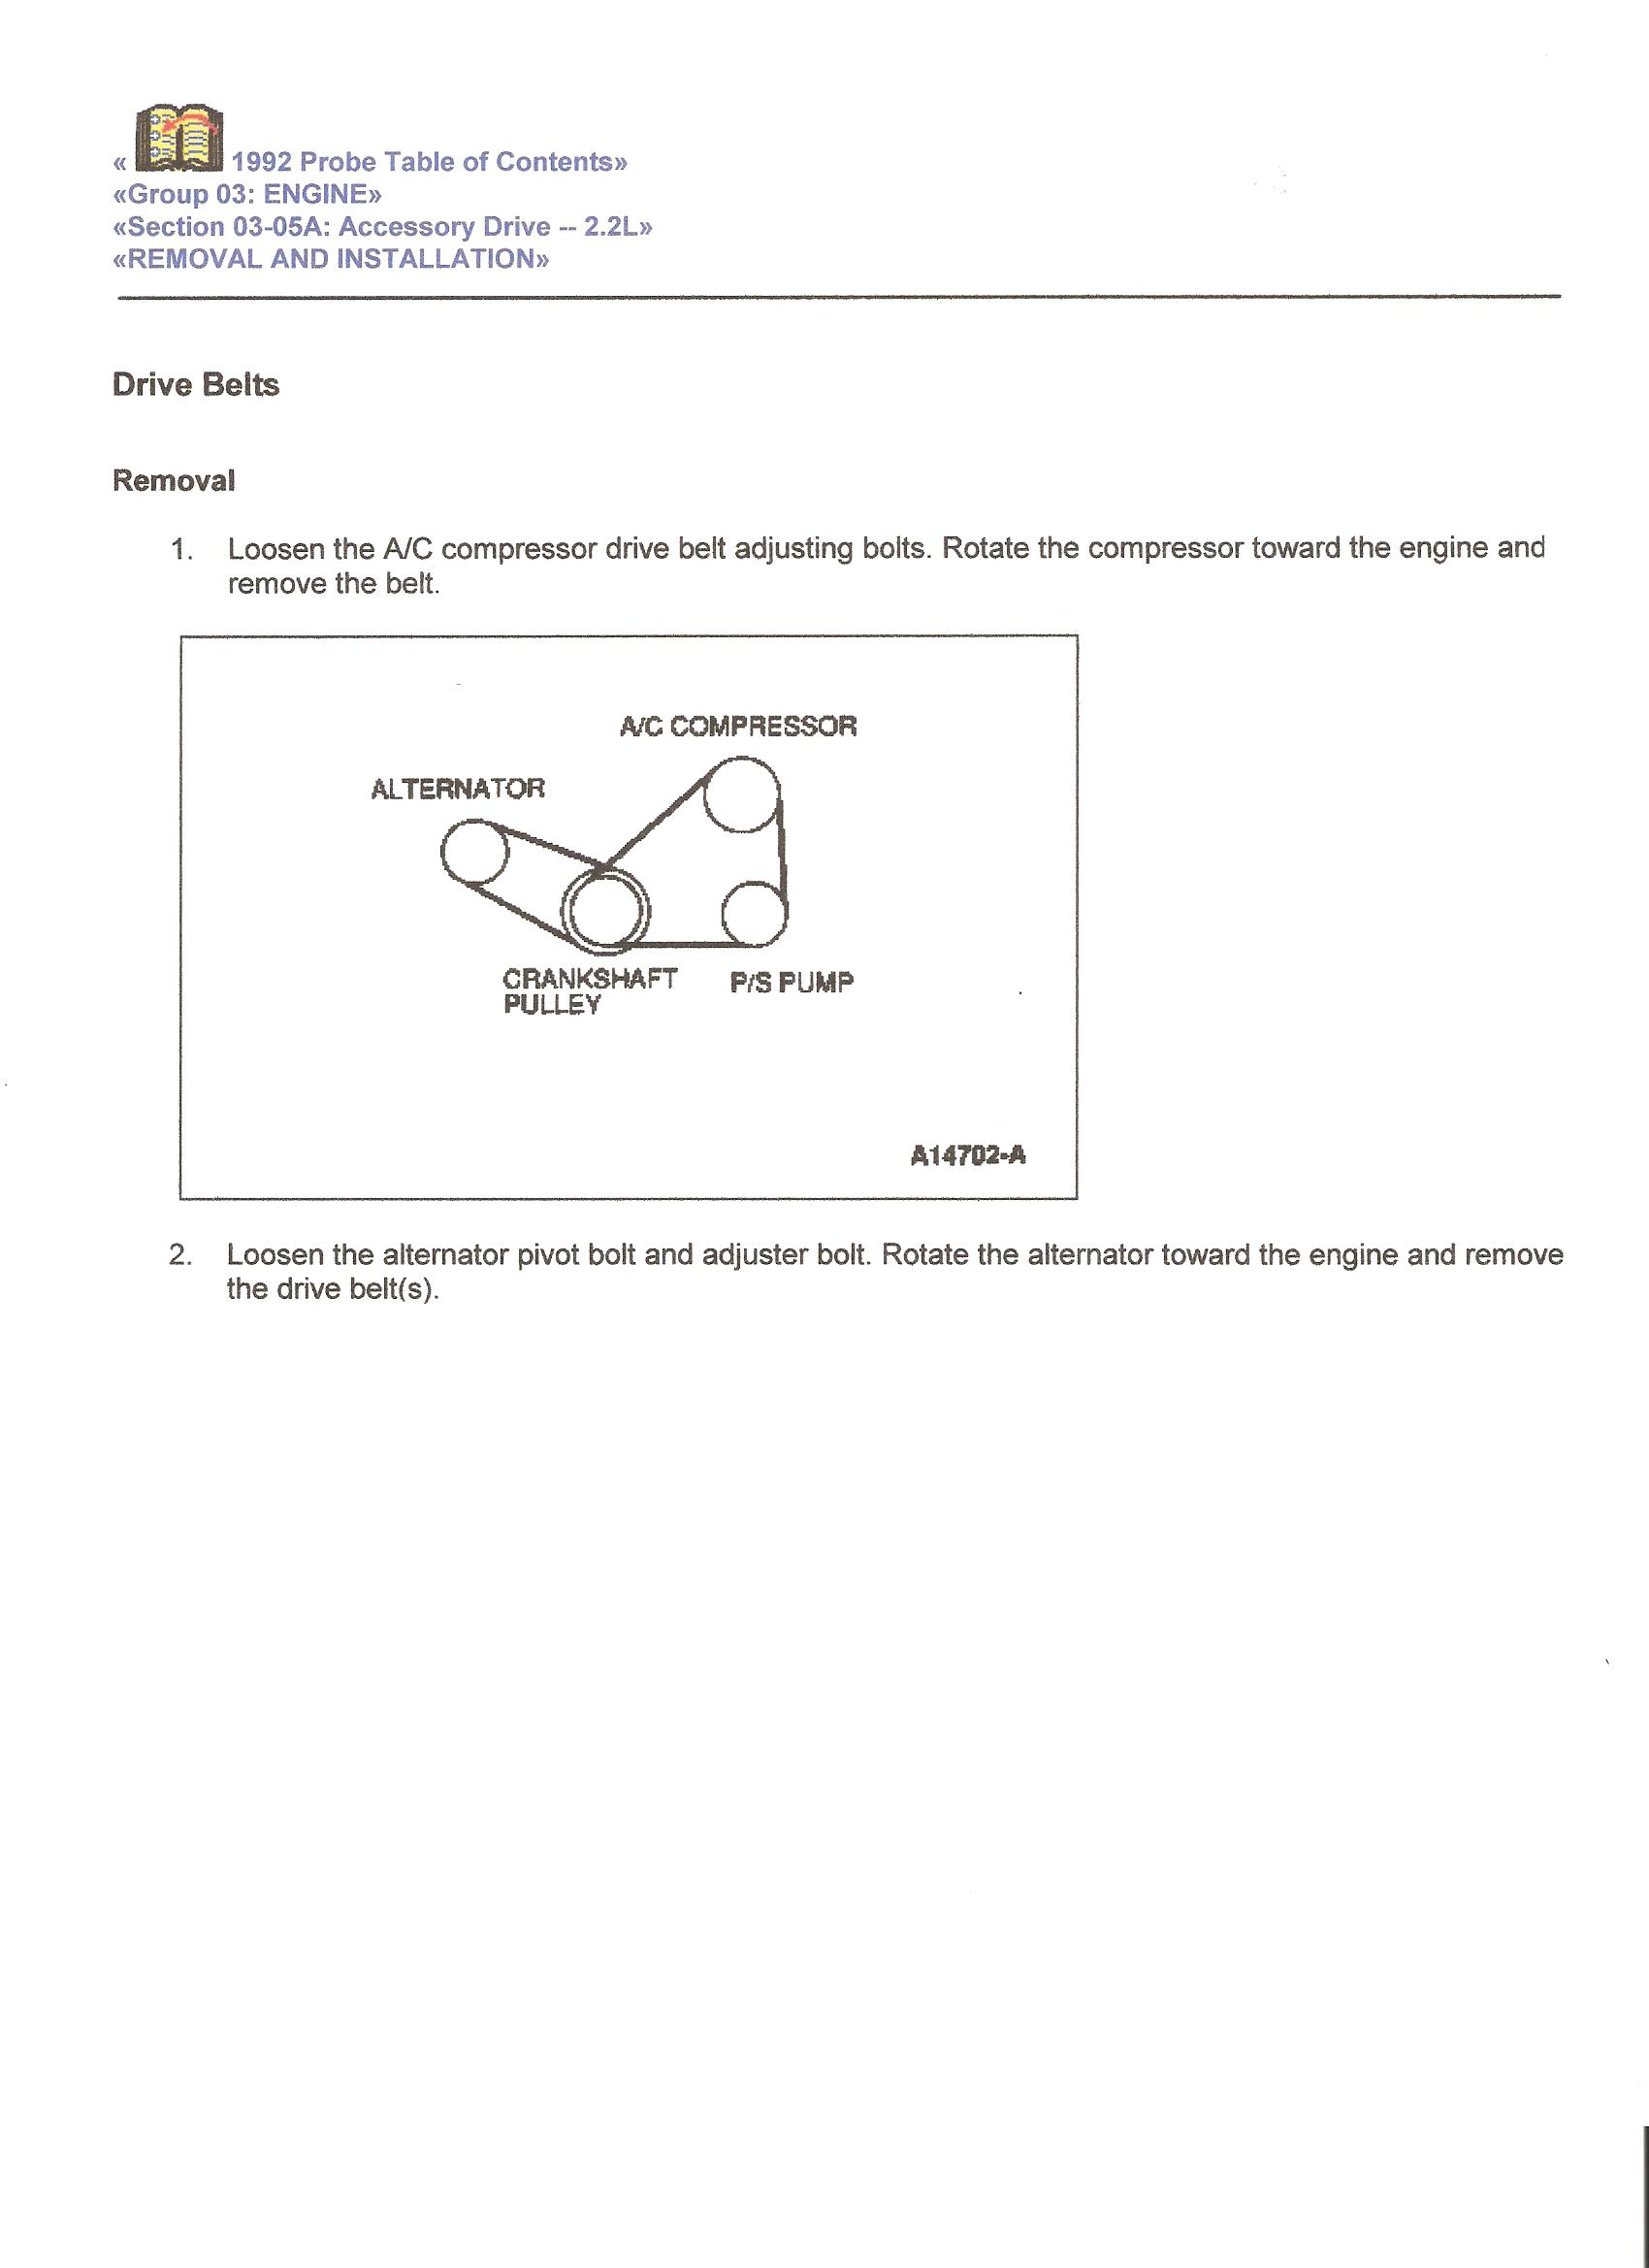 Ford Probe Alternator Wiring Electrical Diagrams Delco Diagram 2003 1989 Product U2022 Ranger